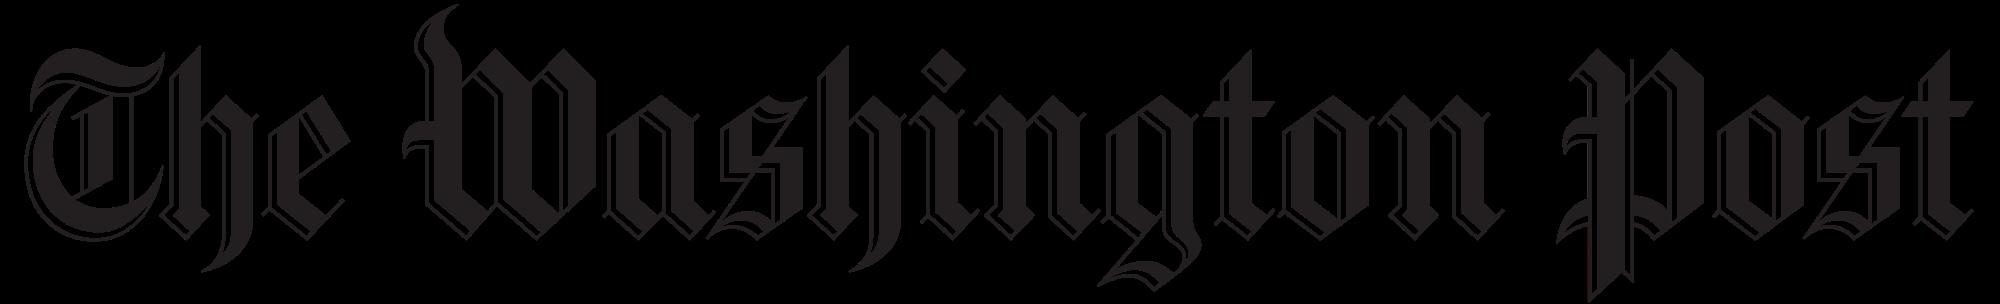 The_Washington_Post